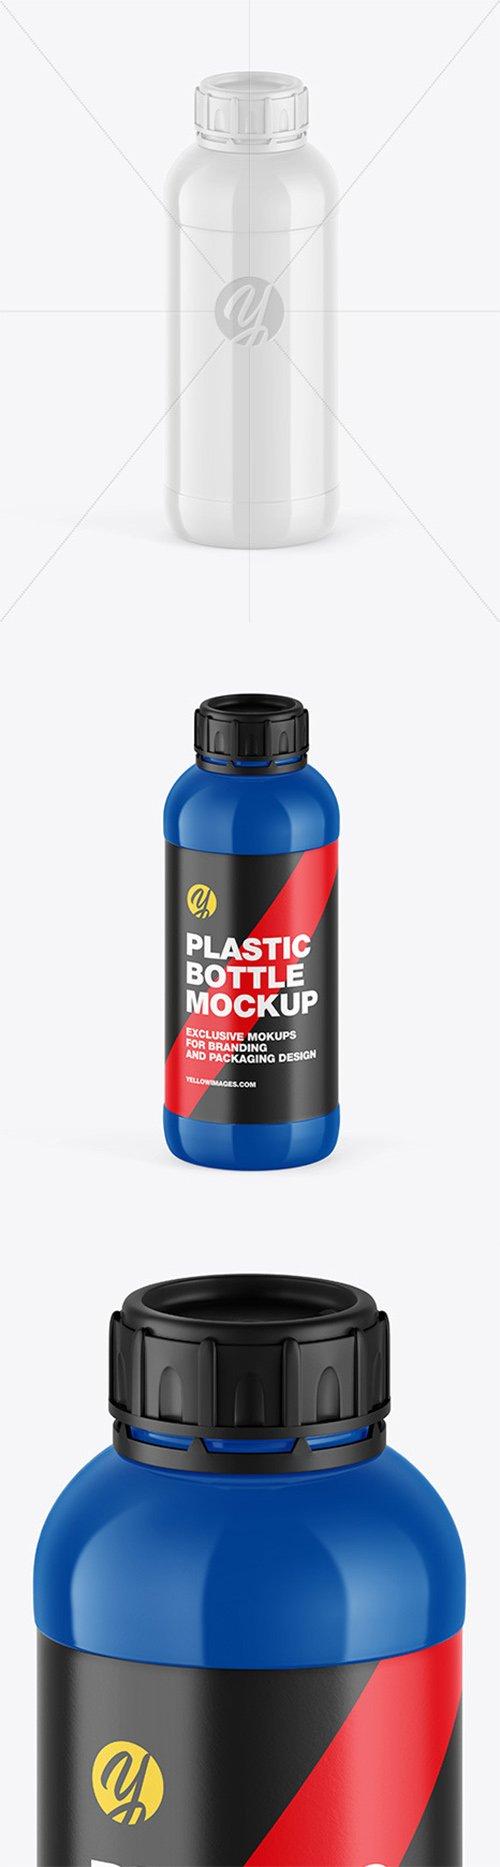 Glossy Plastic Bottle Mockup 66466 TIF